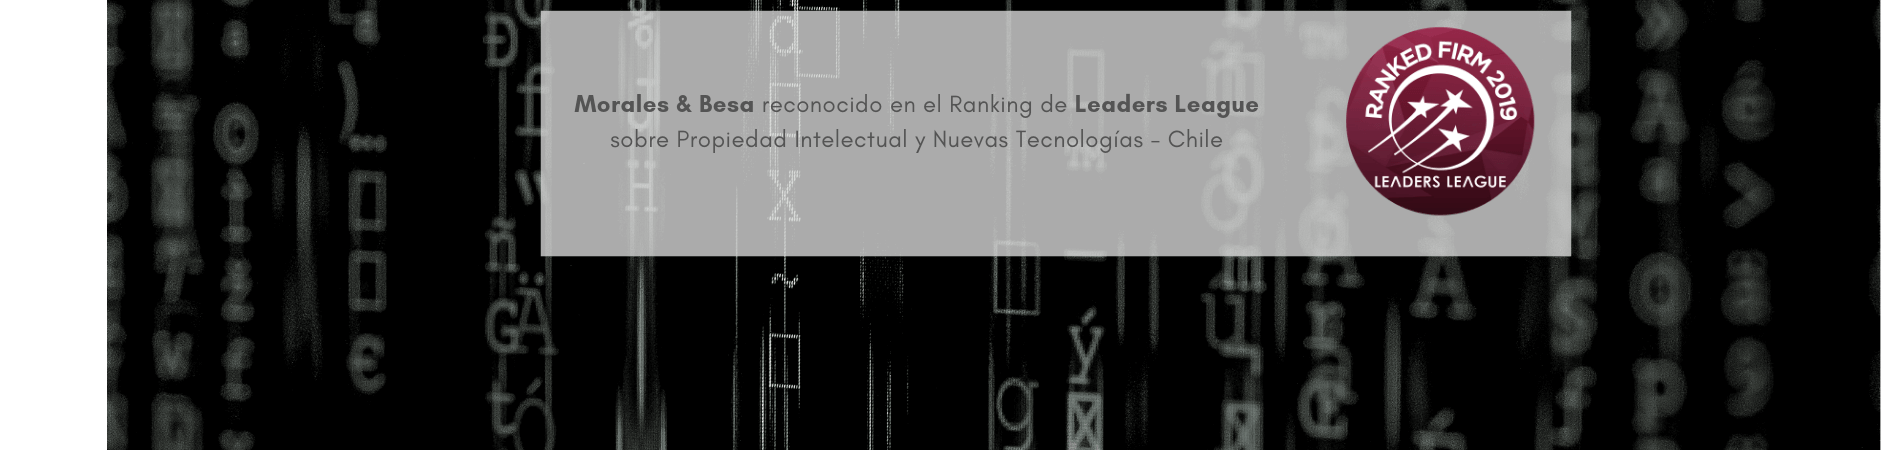 leaders league ip web